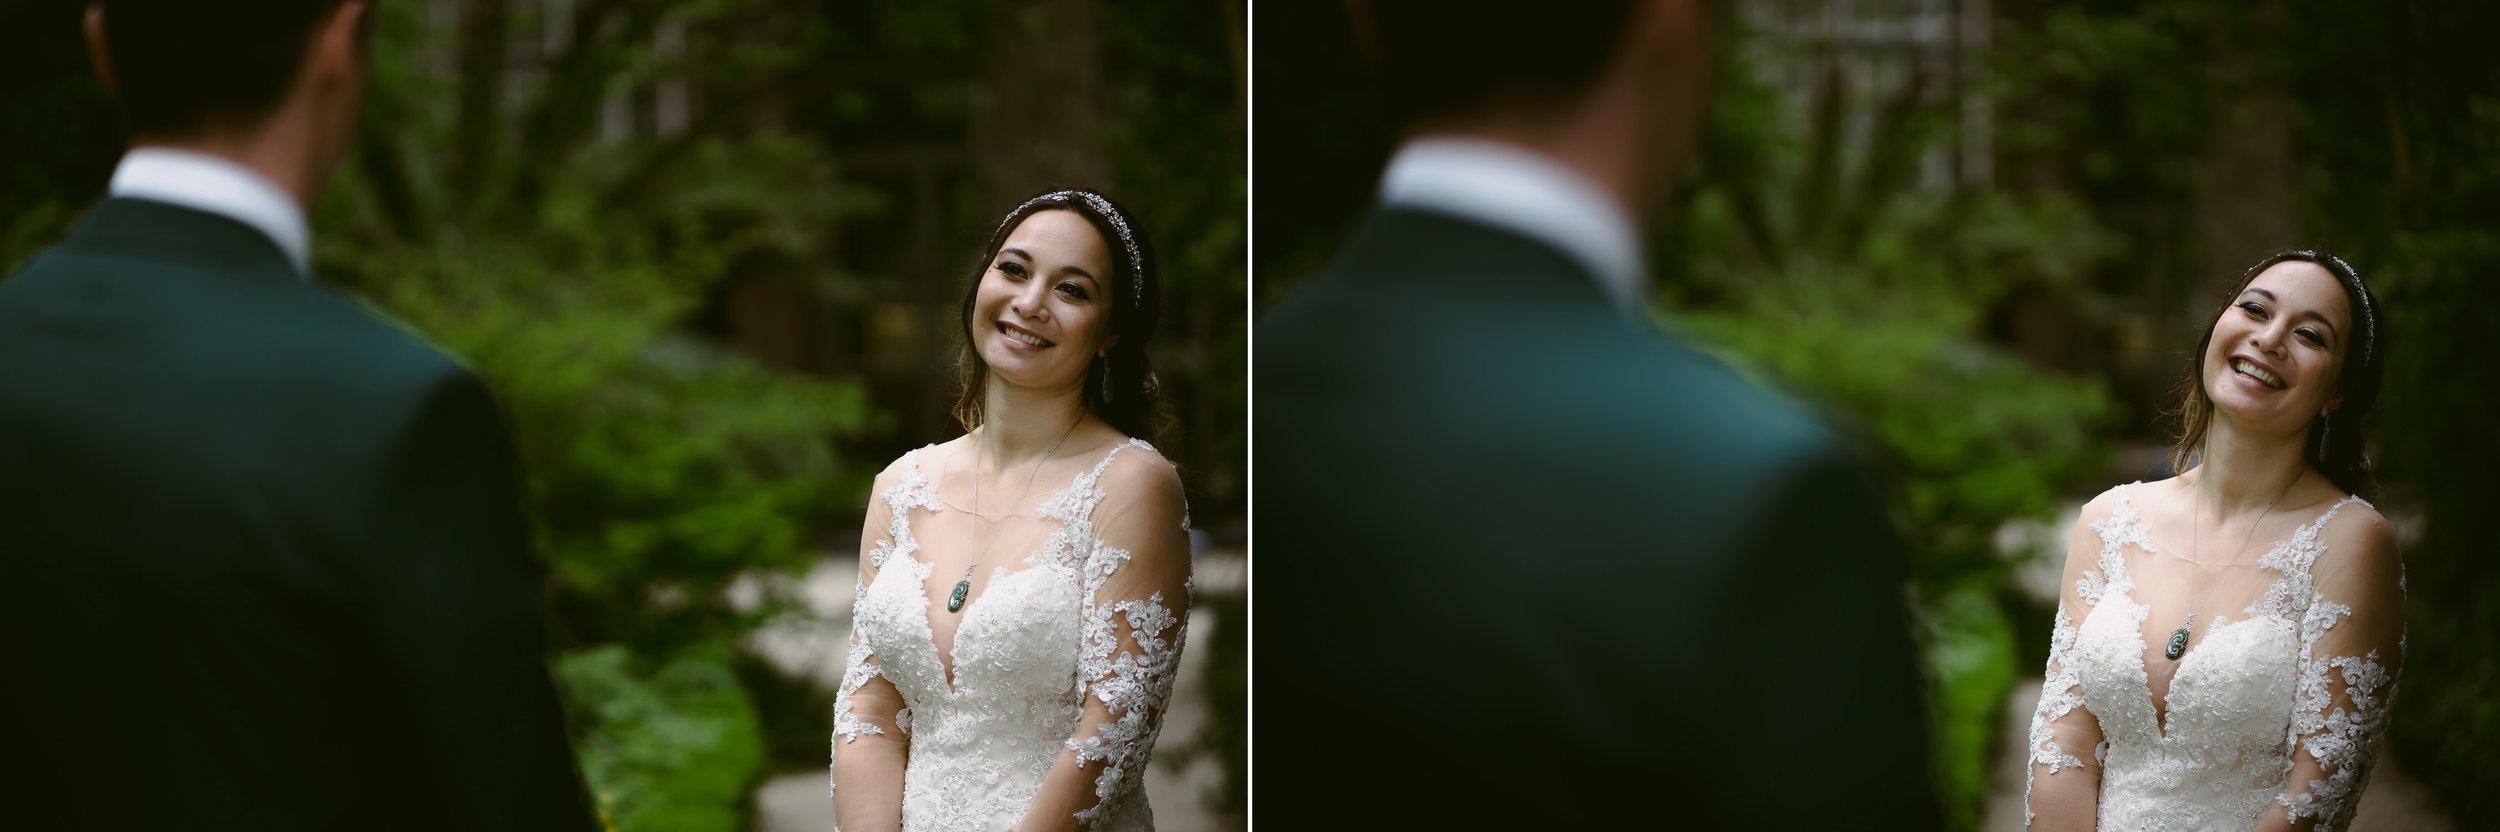 bruidsfotografie-amsterdam-utrecht-trouwfotograaf-mark-hadden-wedding-photography-Robin & Guus-042-3 copy.jpg